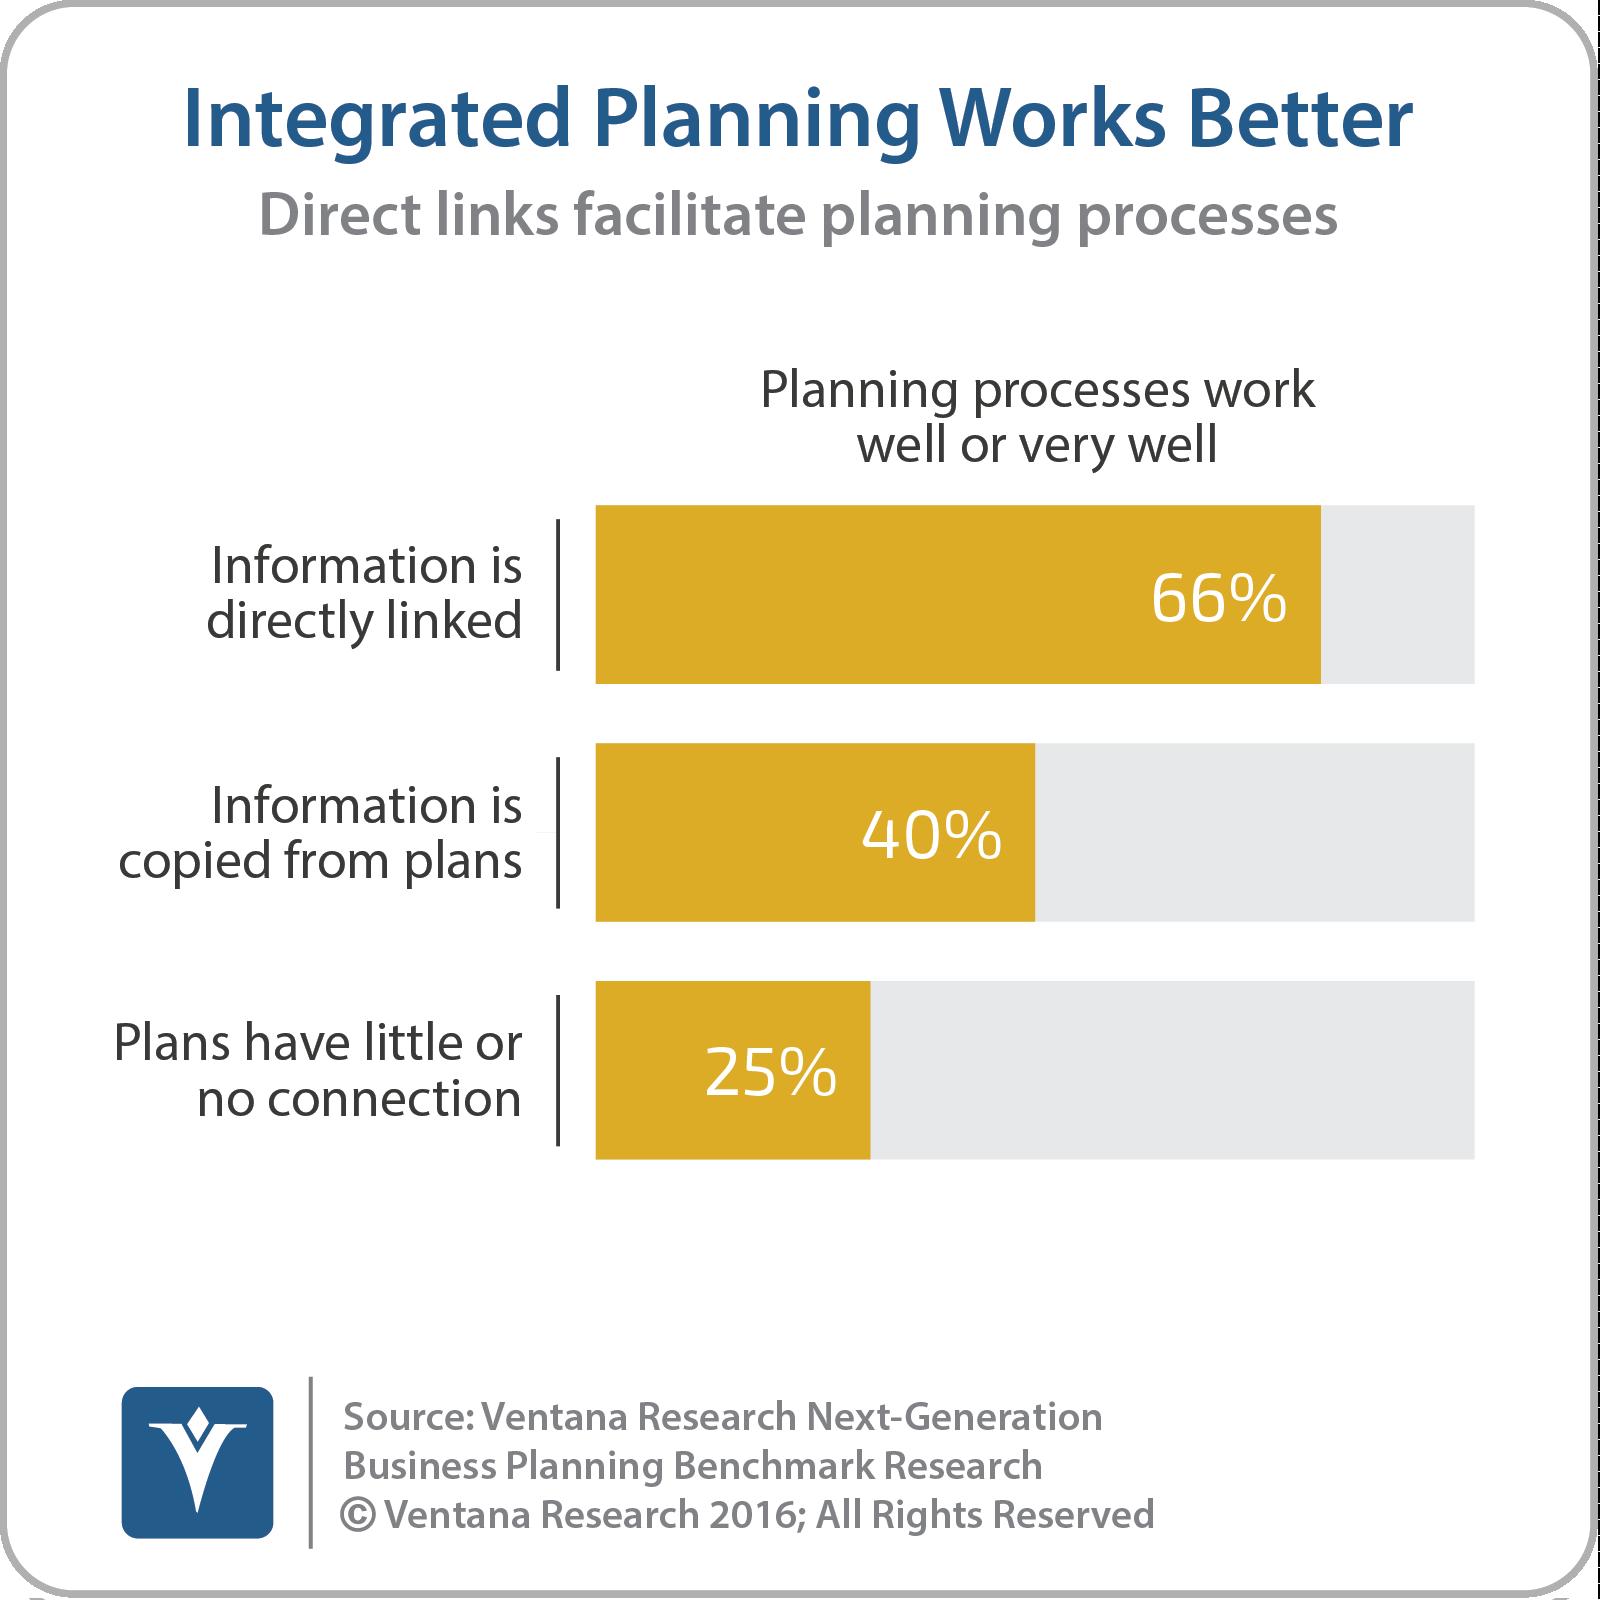 vr_NGBP_02_integrated_planning_works_better_update-9